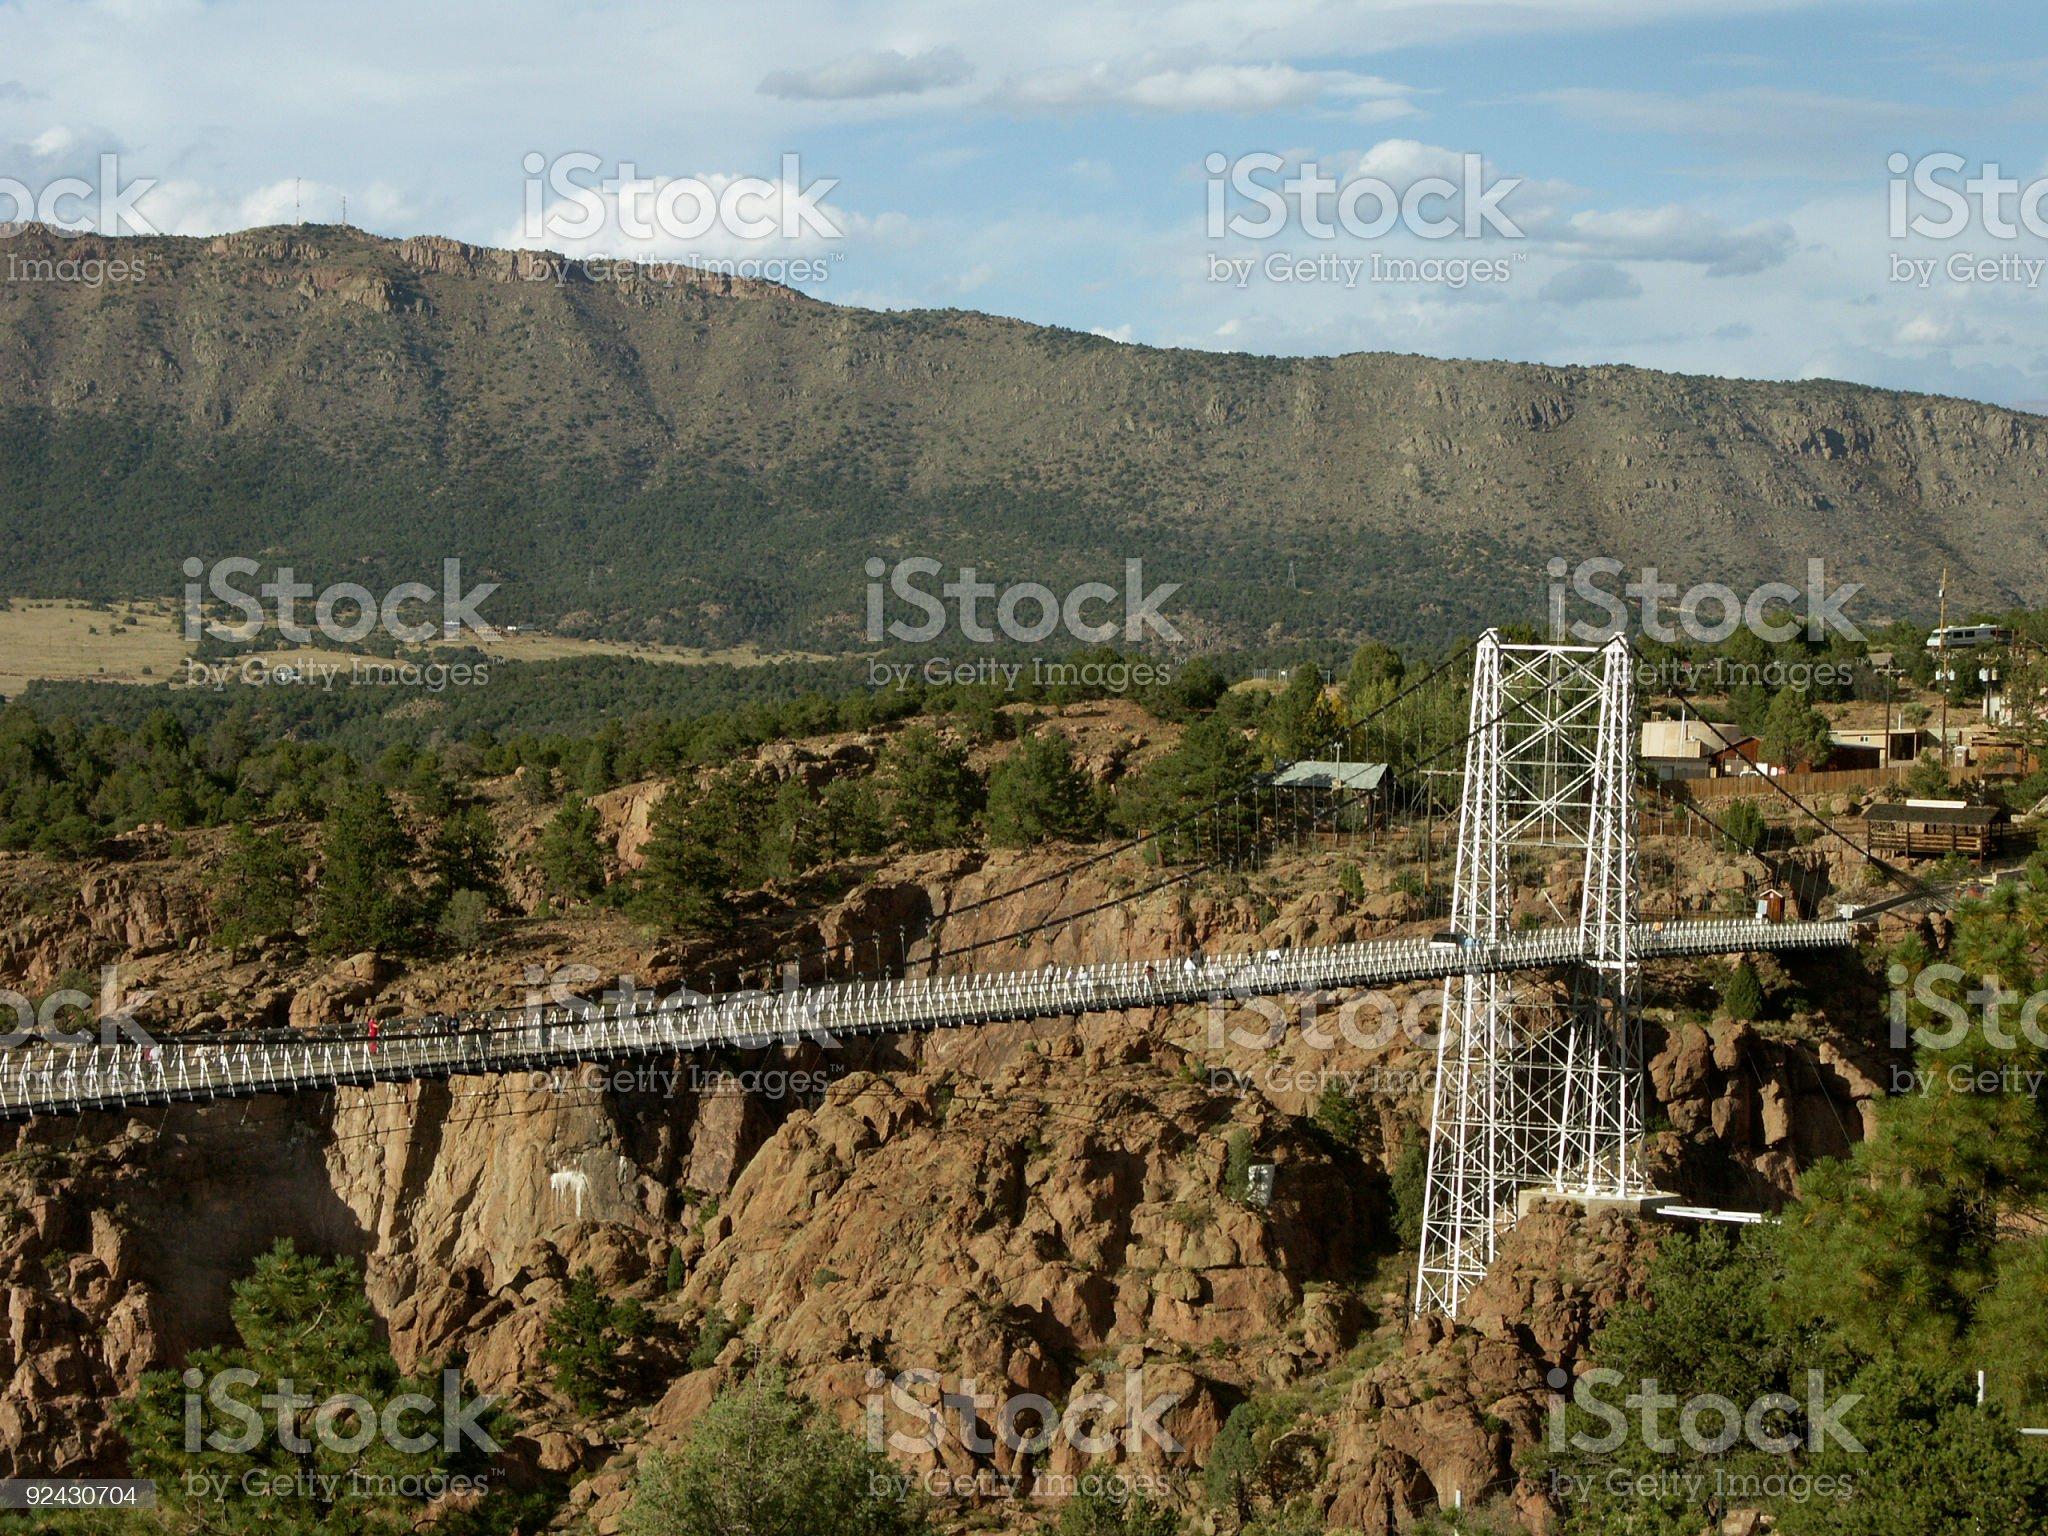 Royal Gorge Bridge. Fragment. royalty-free stock photo